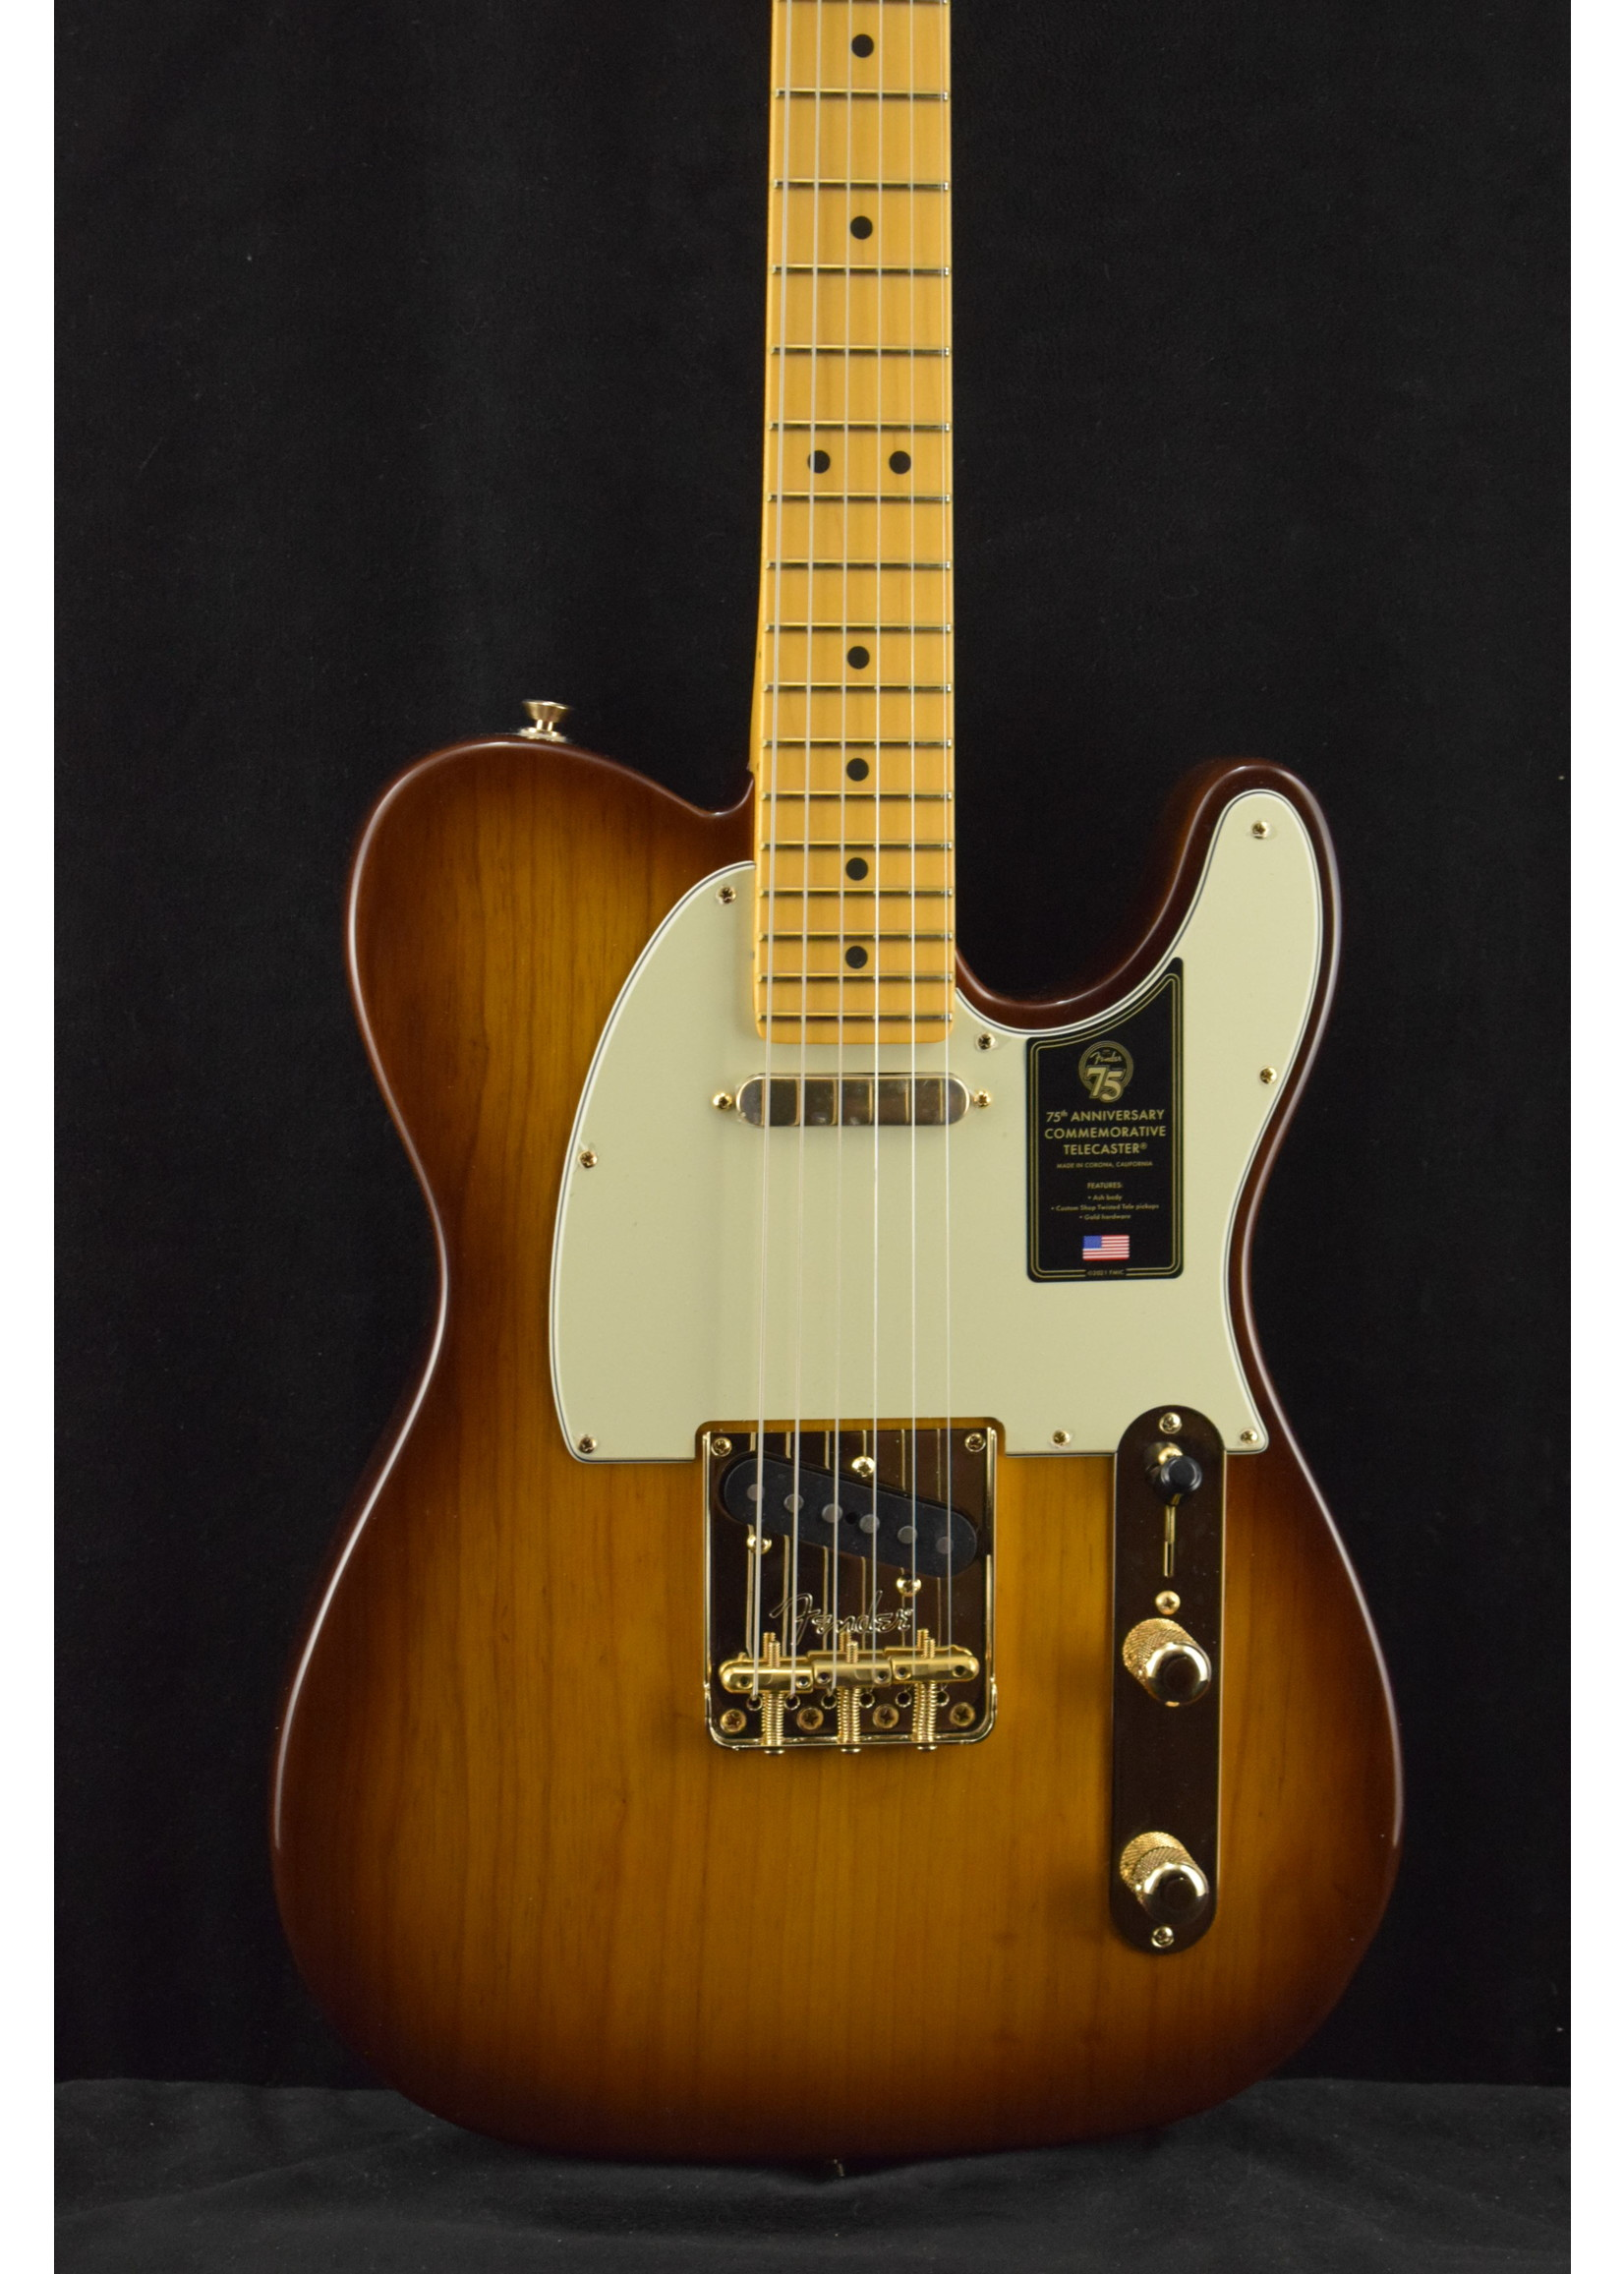 Fender Fender 75th Anniversary Commemorative Telecaster 2-Color Bourbon Burst